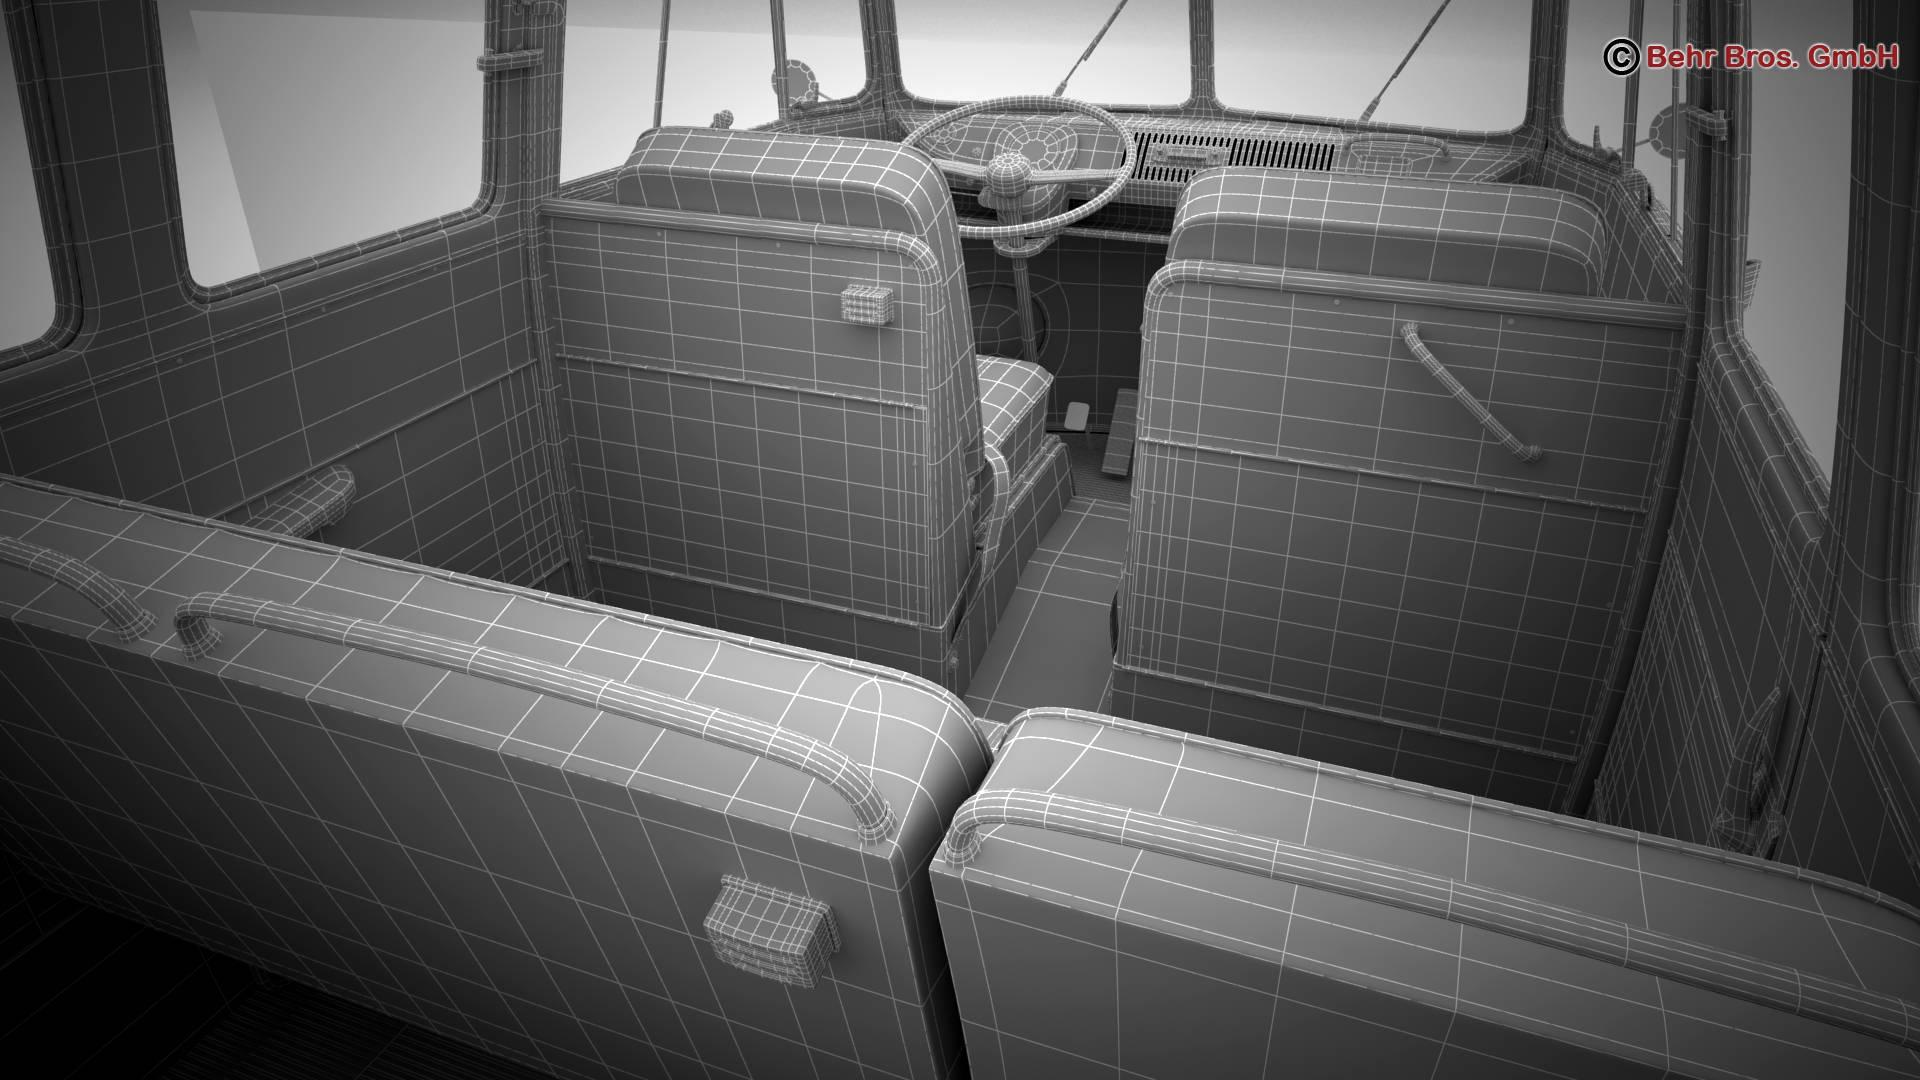 volkswagen type 2 samba 1963 hippie 3d model 3ds max fbx c4d lwo ma mb obj 217271